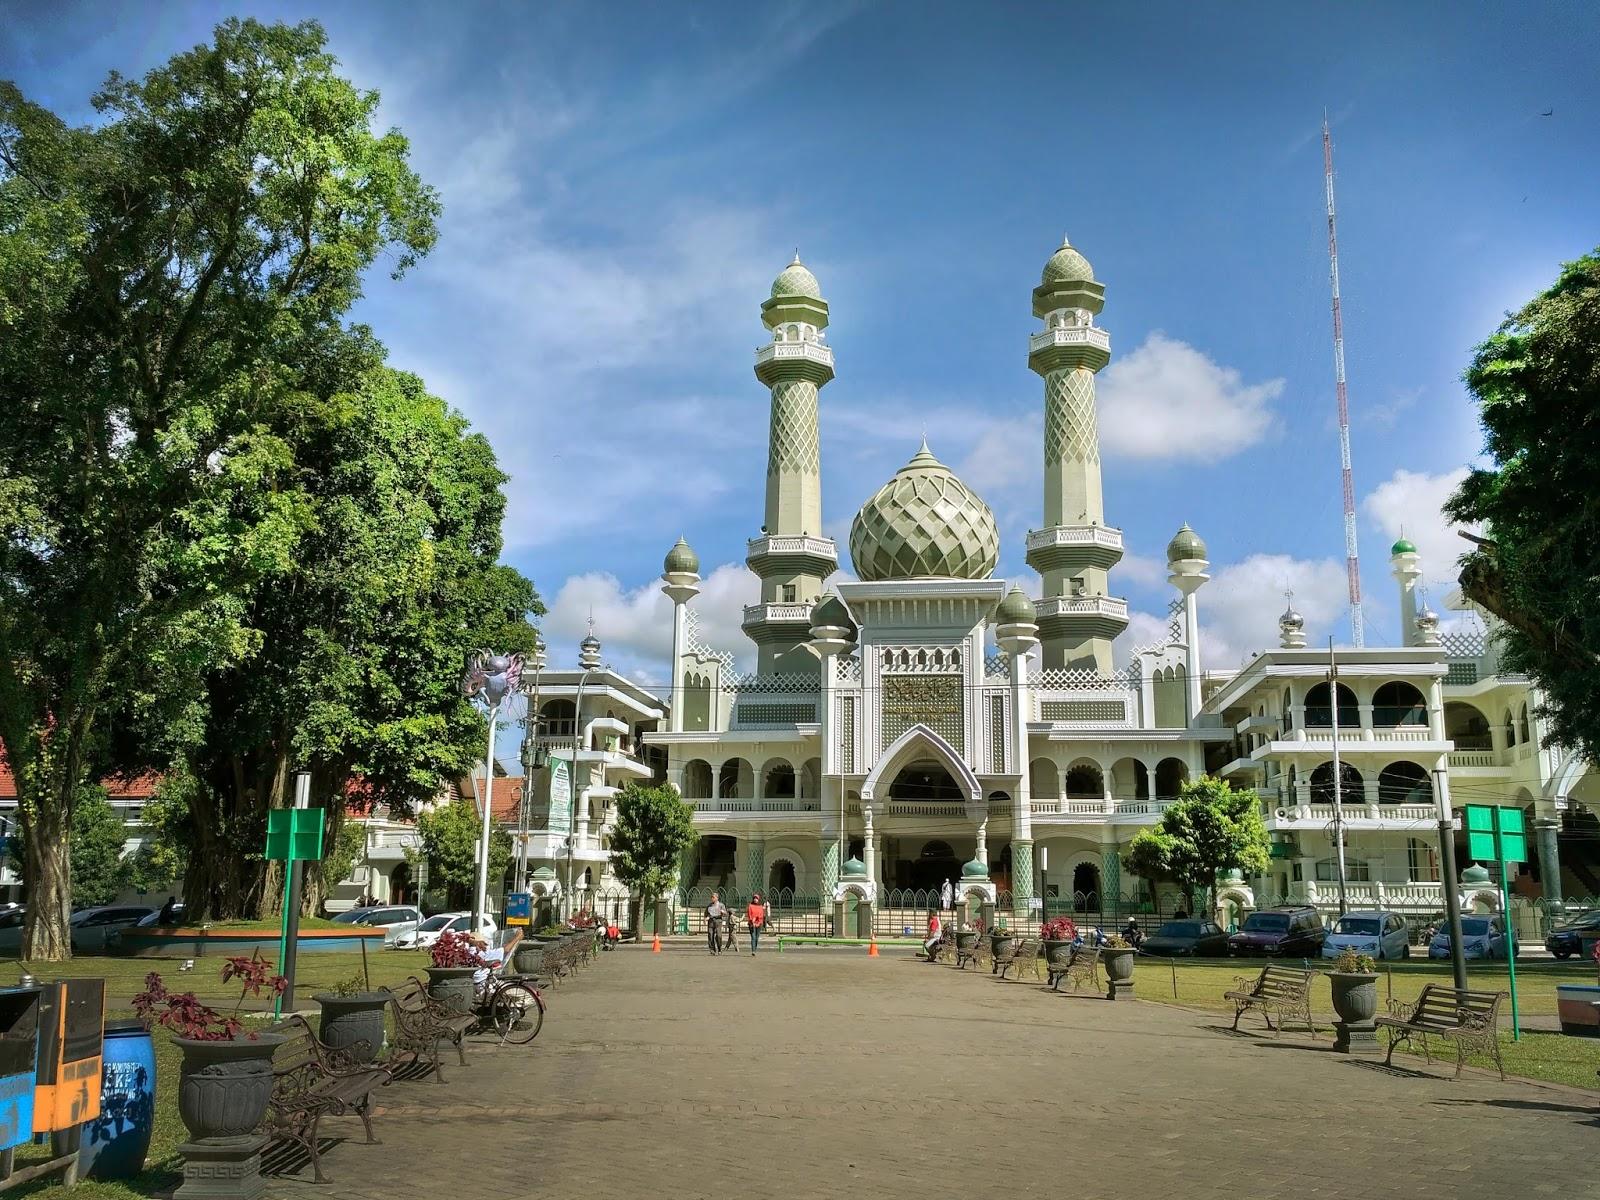 Wisata Kekinian Kota Malang Event Famtrip Ramadhan Asperda 2018 Indiekraf Com